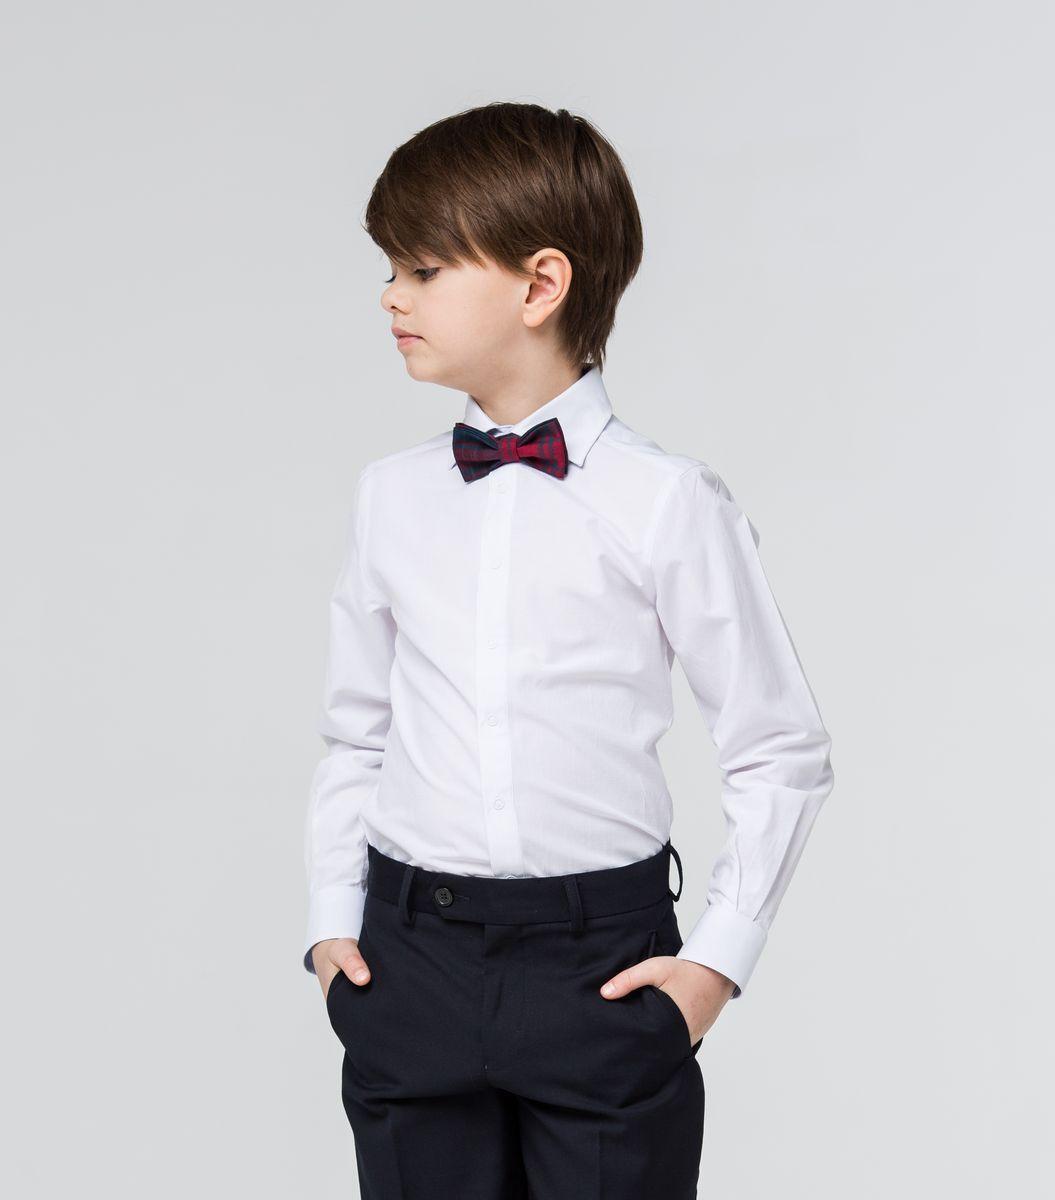 Рубашка для мальчика Silver Spoon, цвет: белый, светло-голубой. SSFSB-629-13831-299. Размер 158 silver spoon ssfsb 625 18701 100 silver spoon